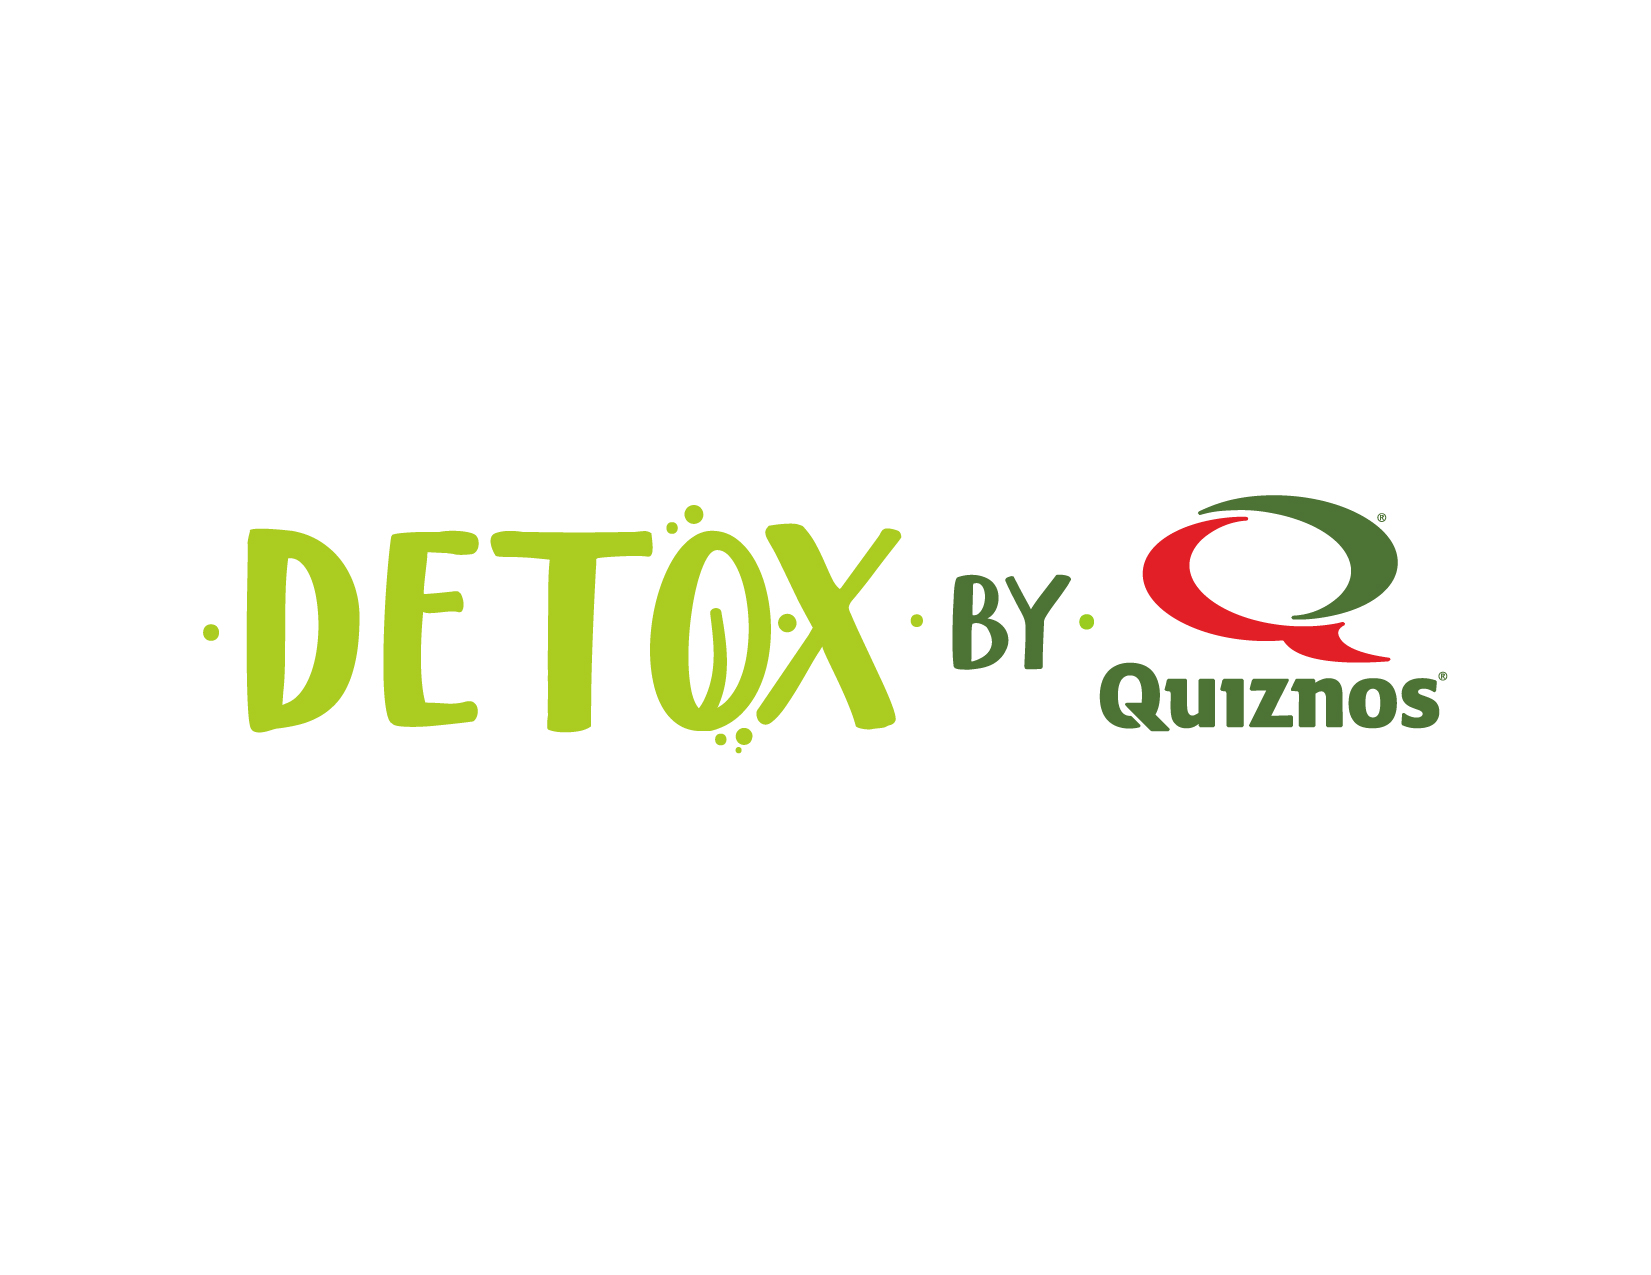 Detox By Quiznos - Calle 99